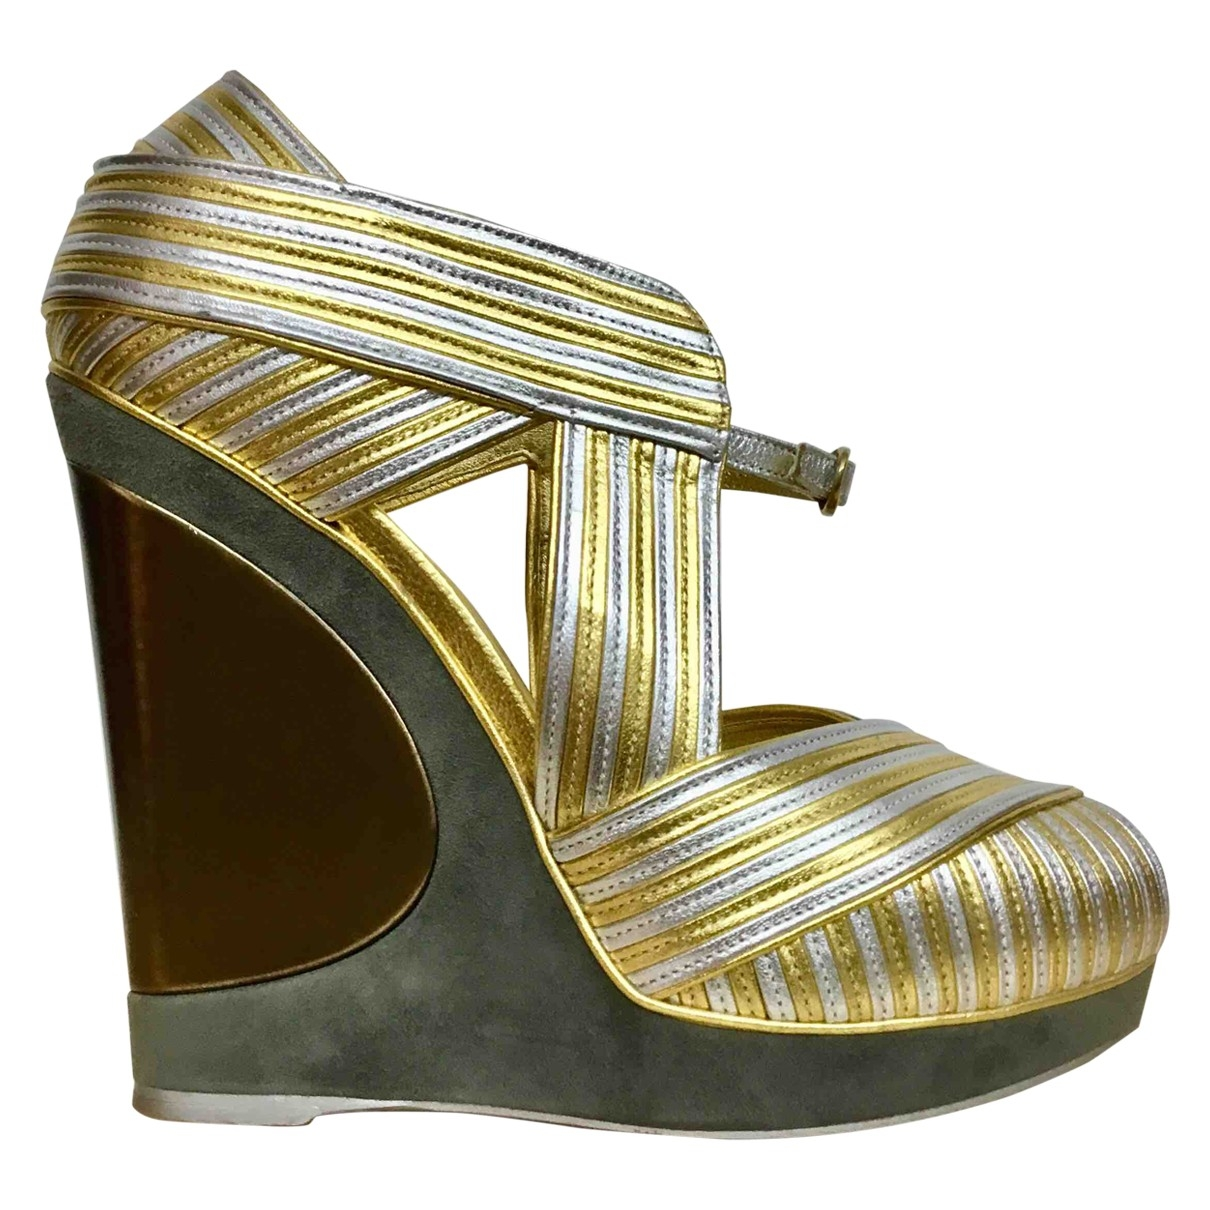 Yves Saint Laurent \N Gold Leather Sandals for Women 37 EU